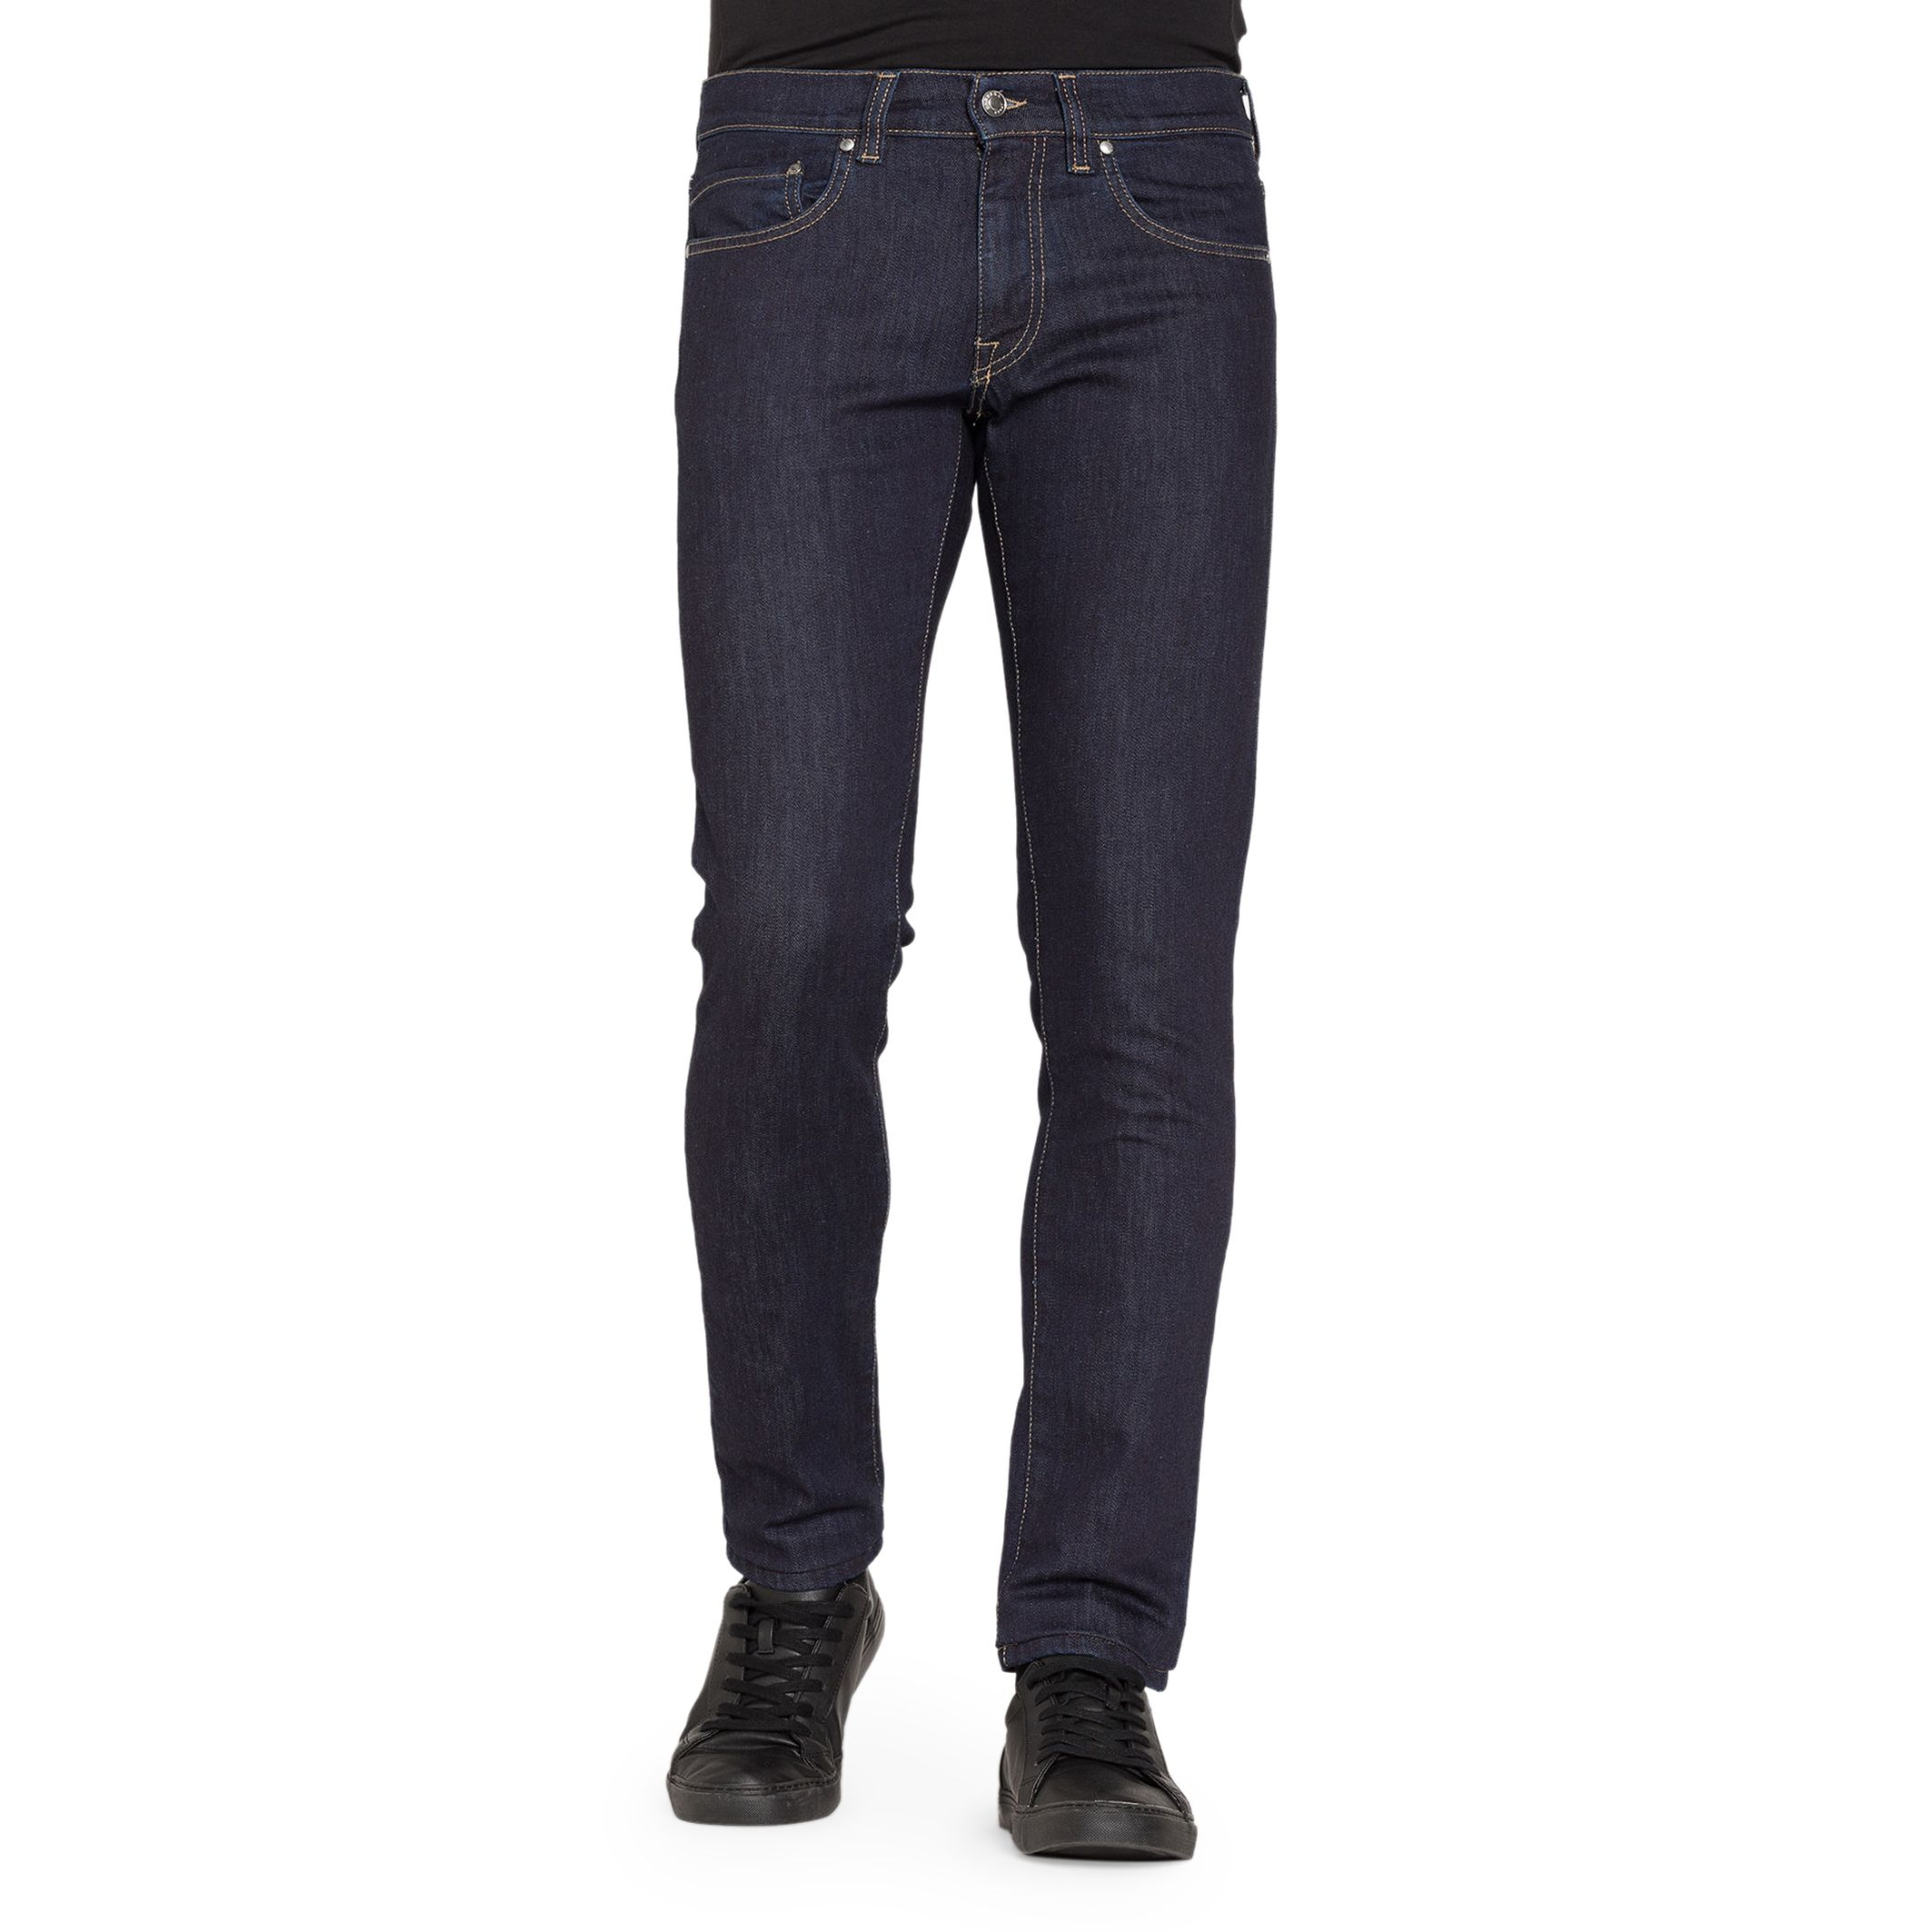 Carrera Jeans - 717_0970A